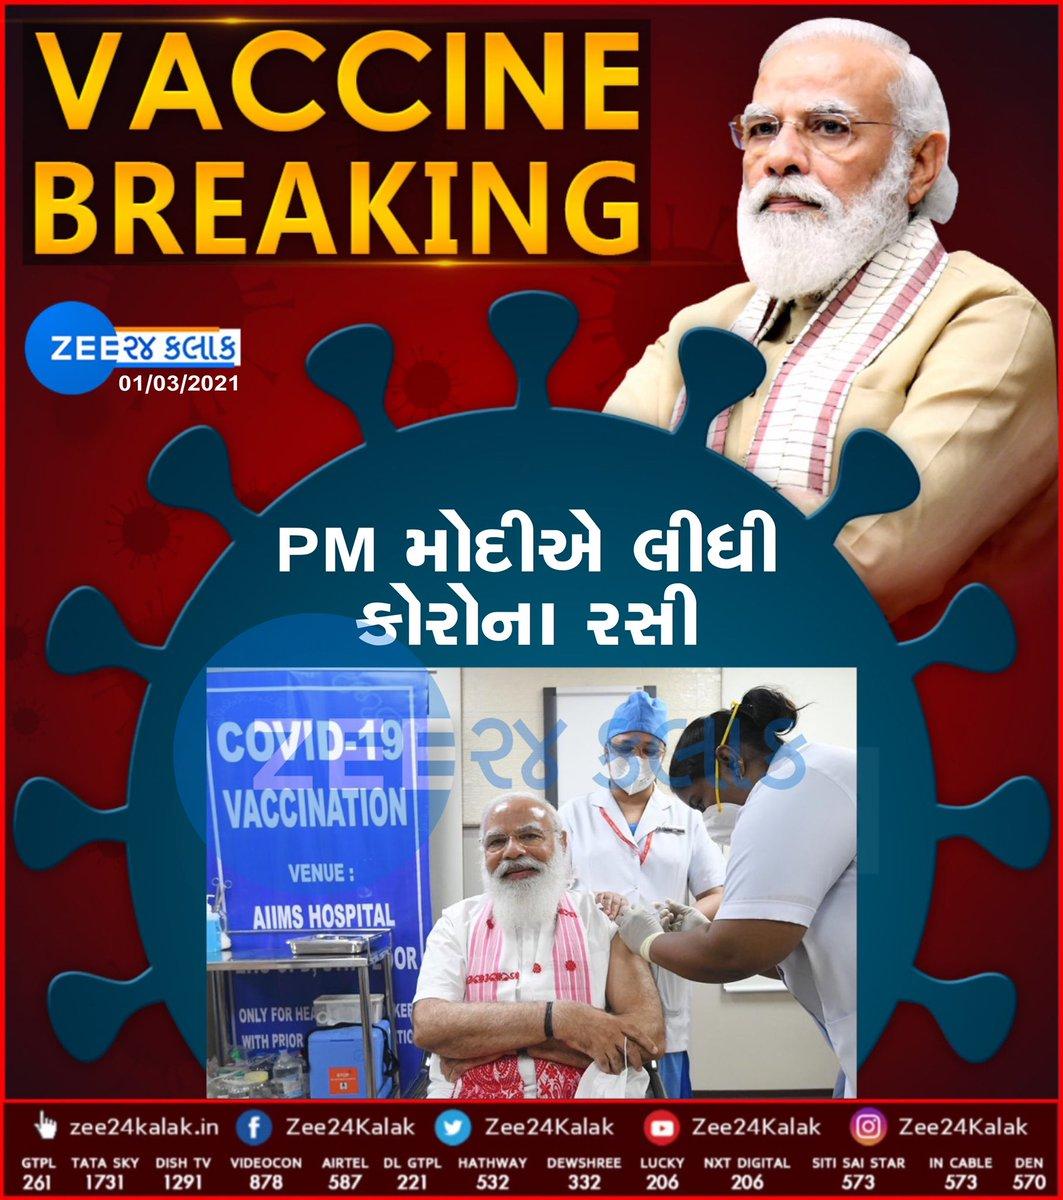 BIG BREAKING: PM @narendramodi એ કોરોના રસીનો પહેલો ડોઝ દિલ્લી AIIMS ખાતે લીધો.. @PMOIndia @MoHFW_INDIA   #CoronaVaccine #Vaccination #NarendraModi